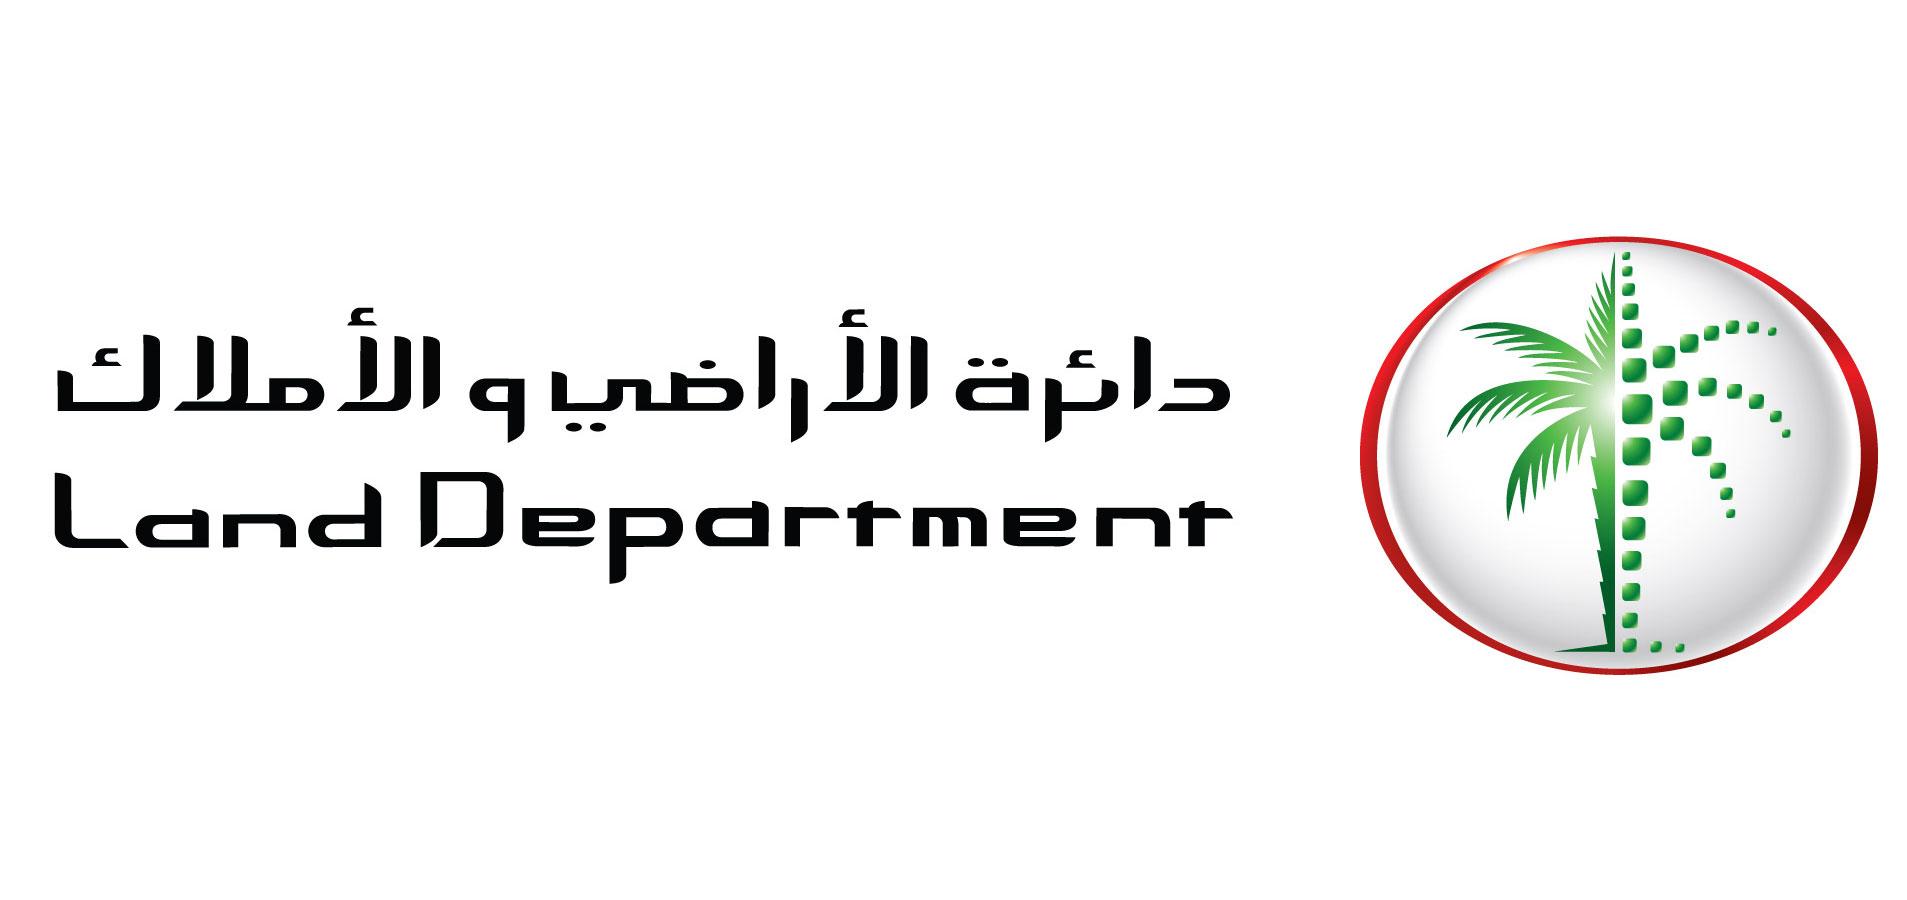 Dubai Land Department introduces remote property registration system